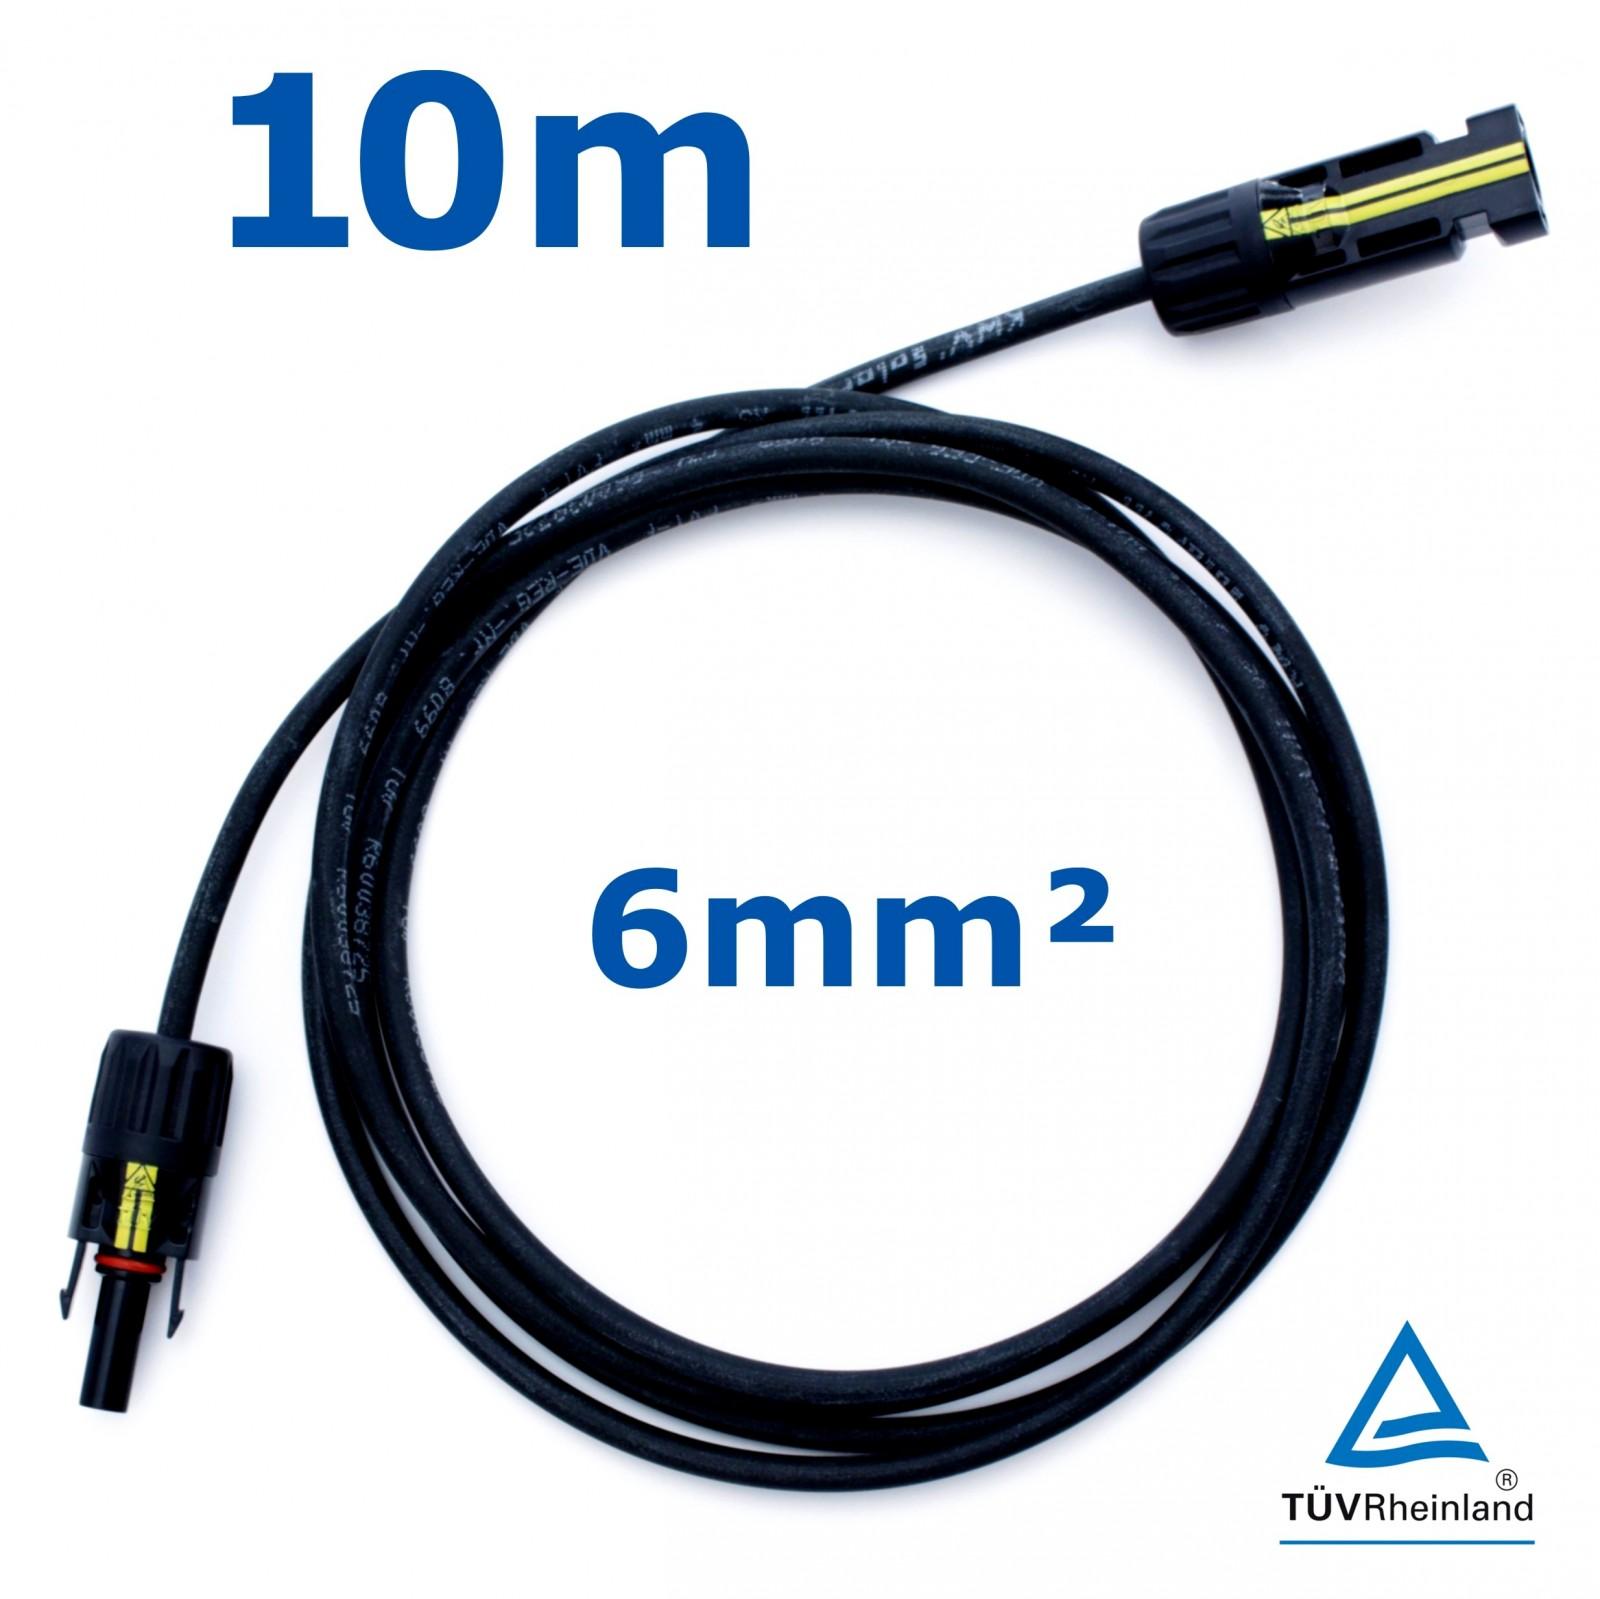 10 m solarkabel pv kabel 6 mm rot schwarz mit buchse und stecker mc4 kompatibel ebay. Black Bedroom Furniture Sets. Home Design Ideas